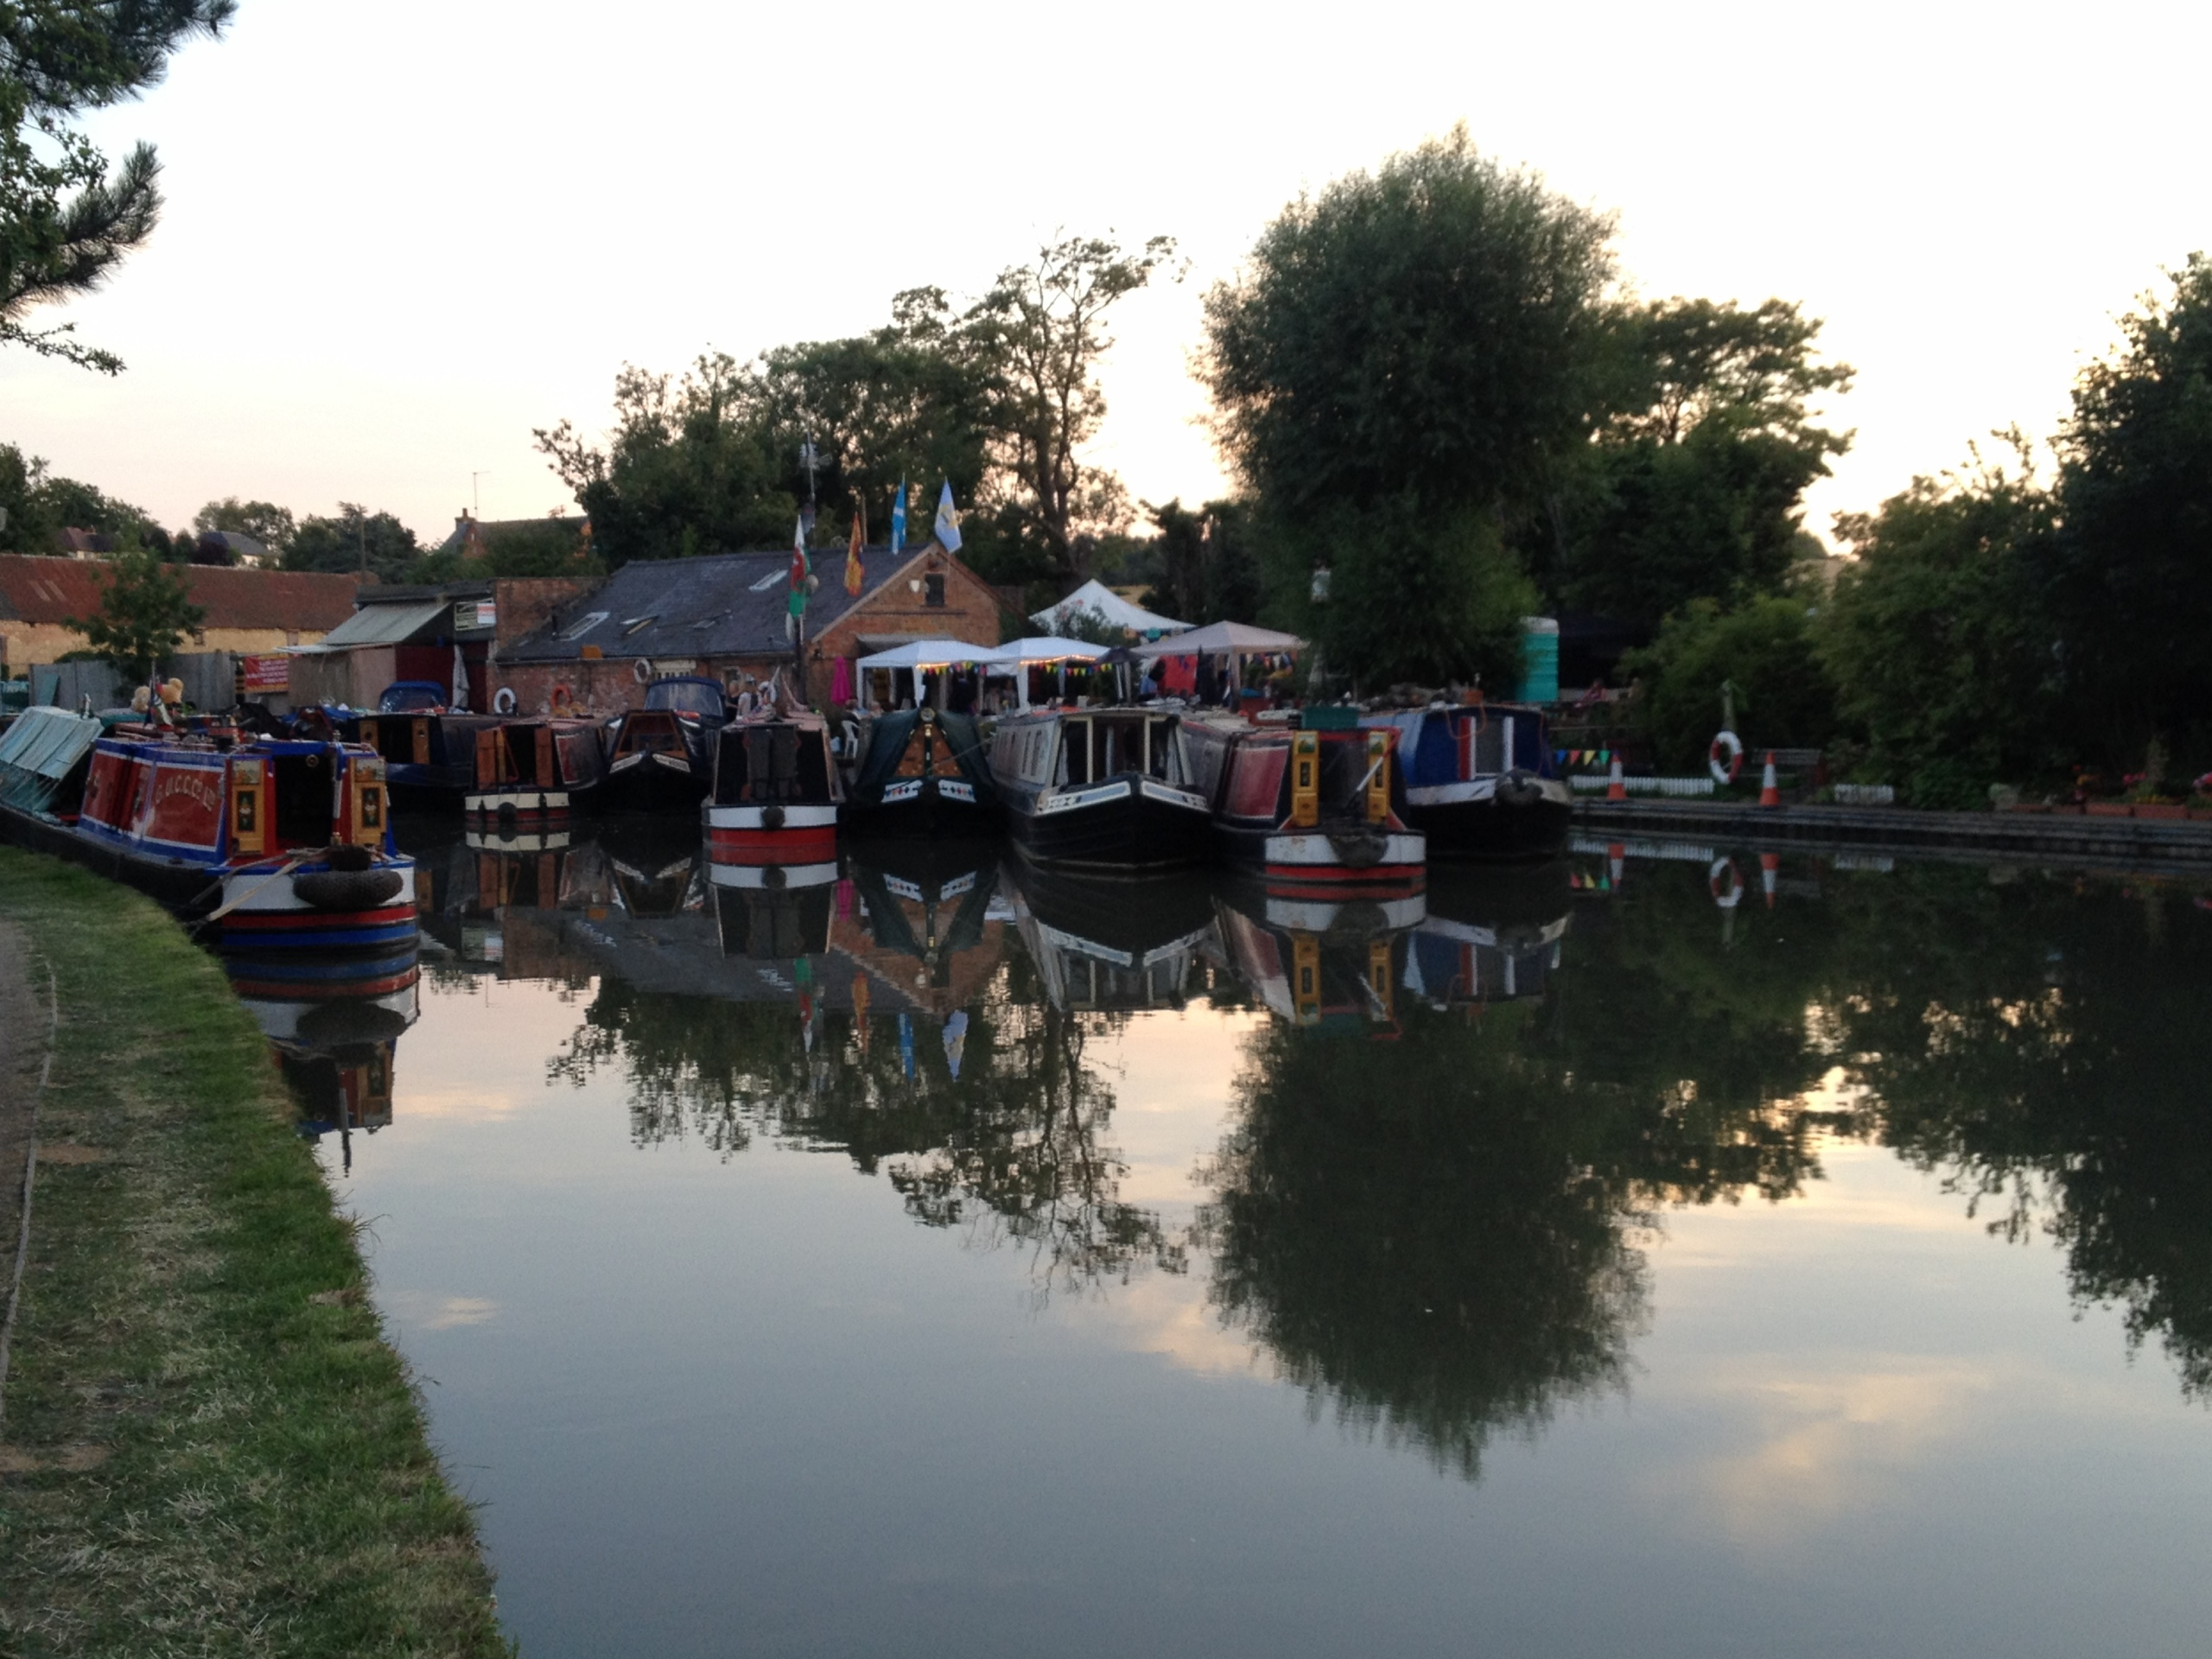 Blisworth Canal Festival 2015